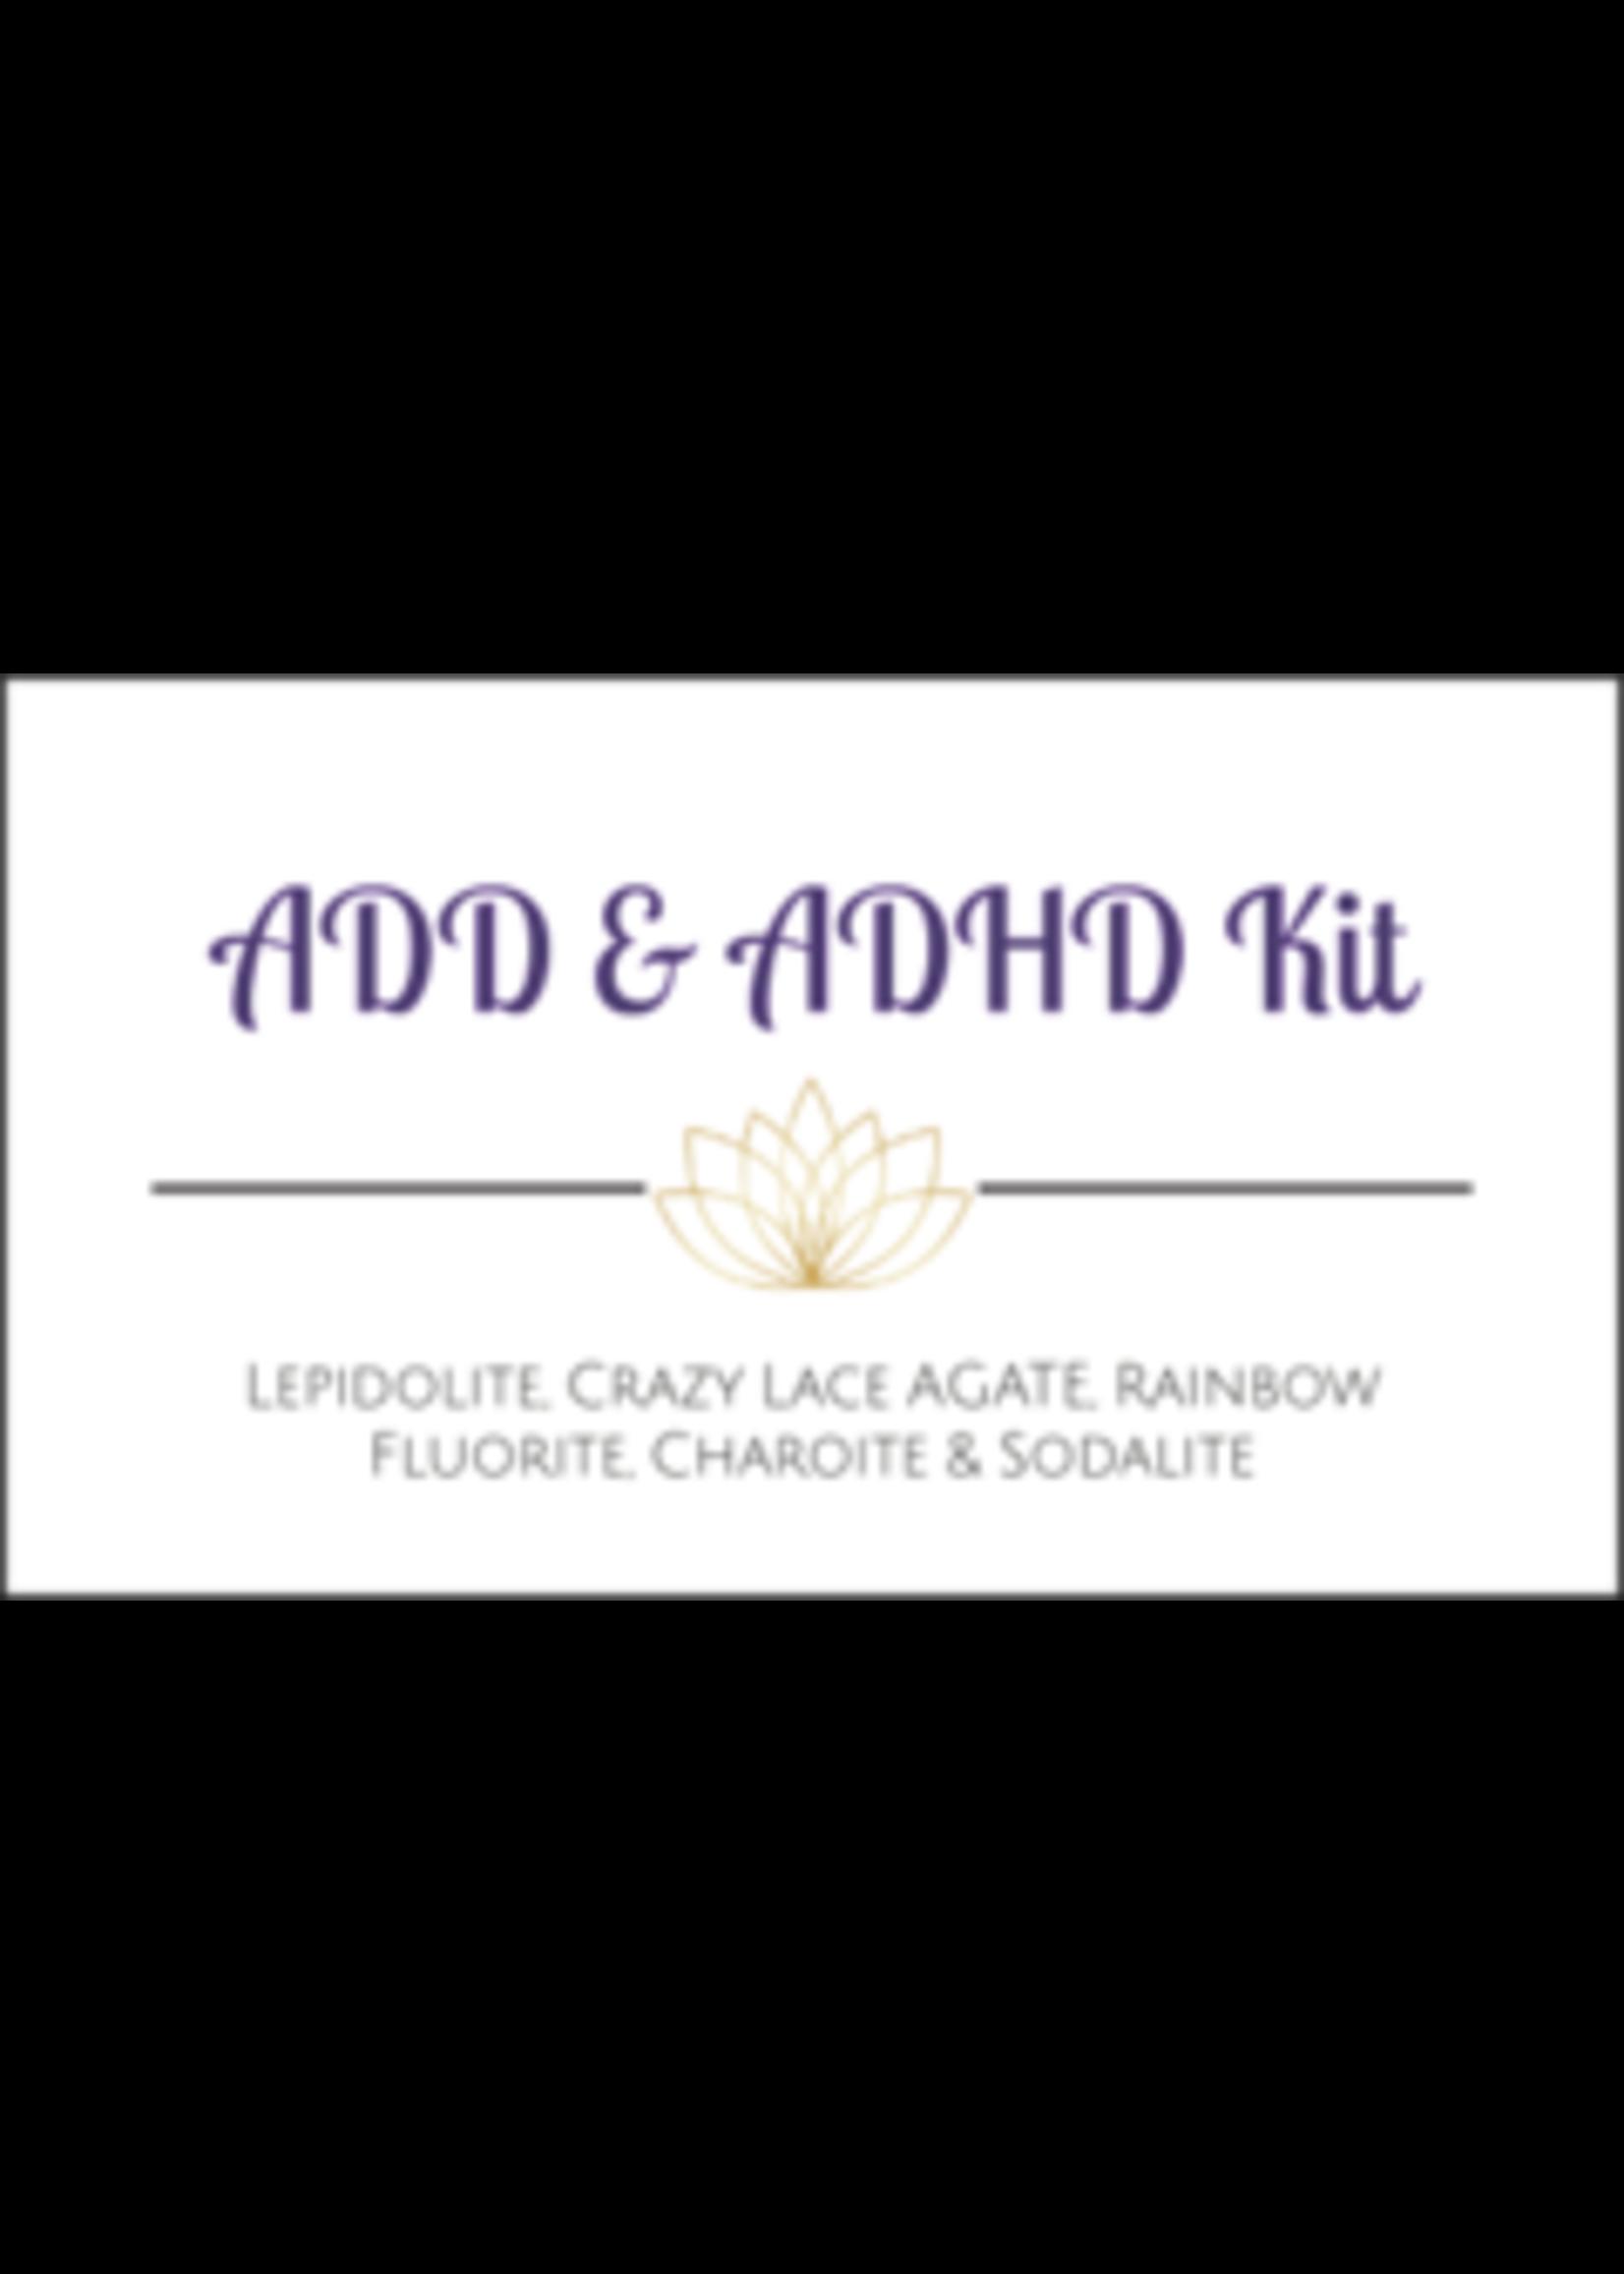 ADD & ADHD Crystal Kit Cards - Box of 100